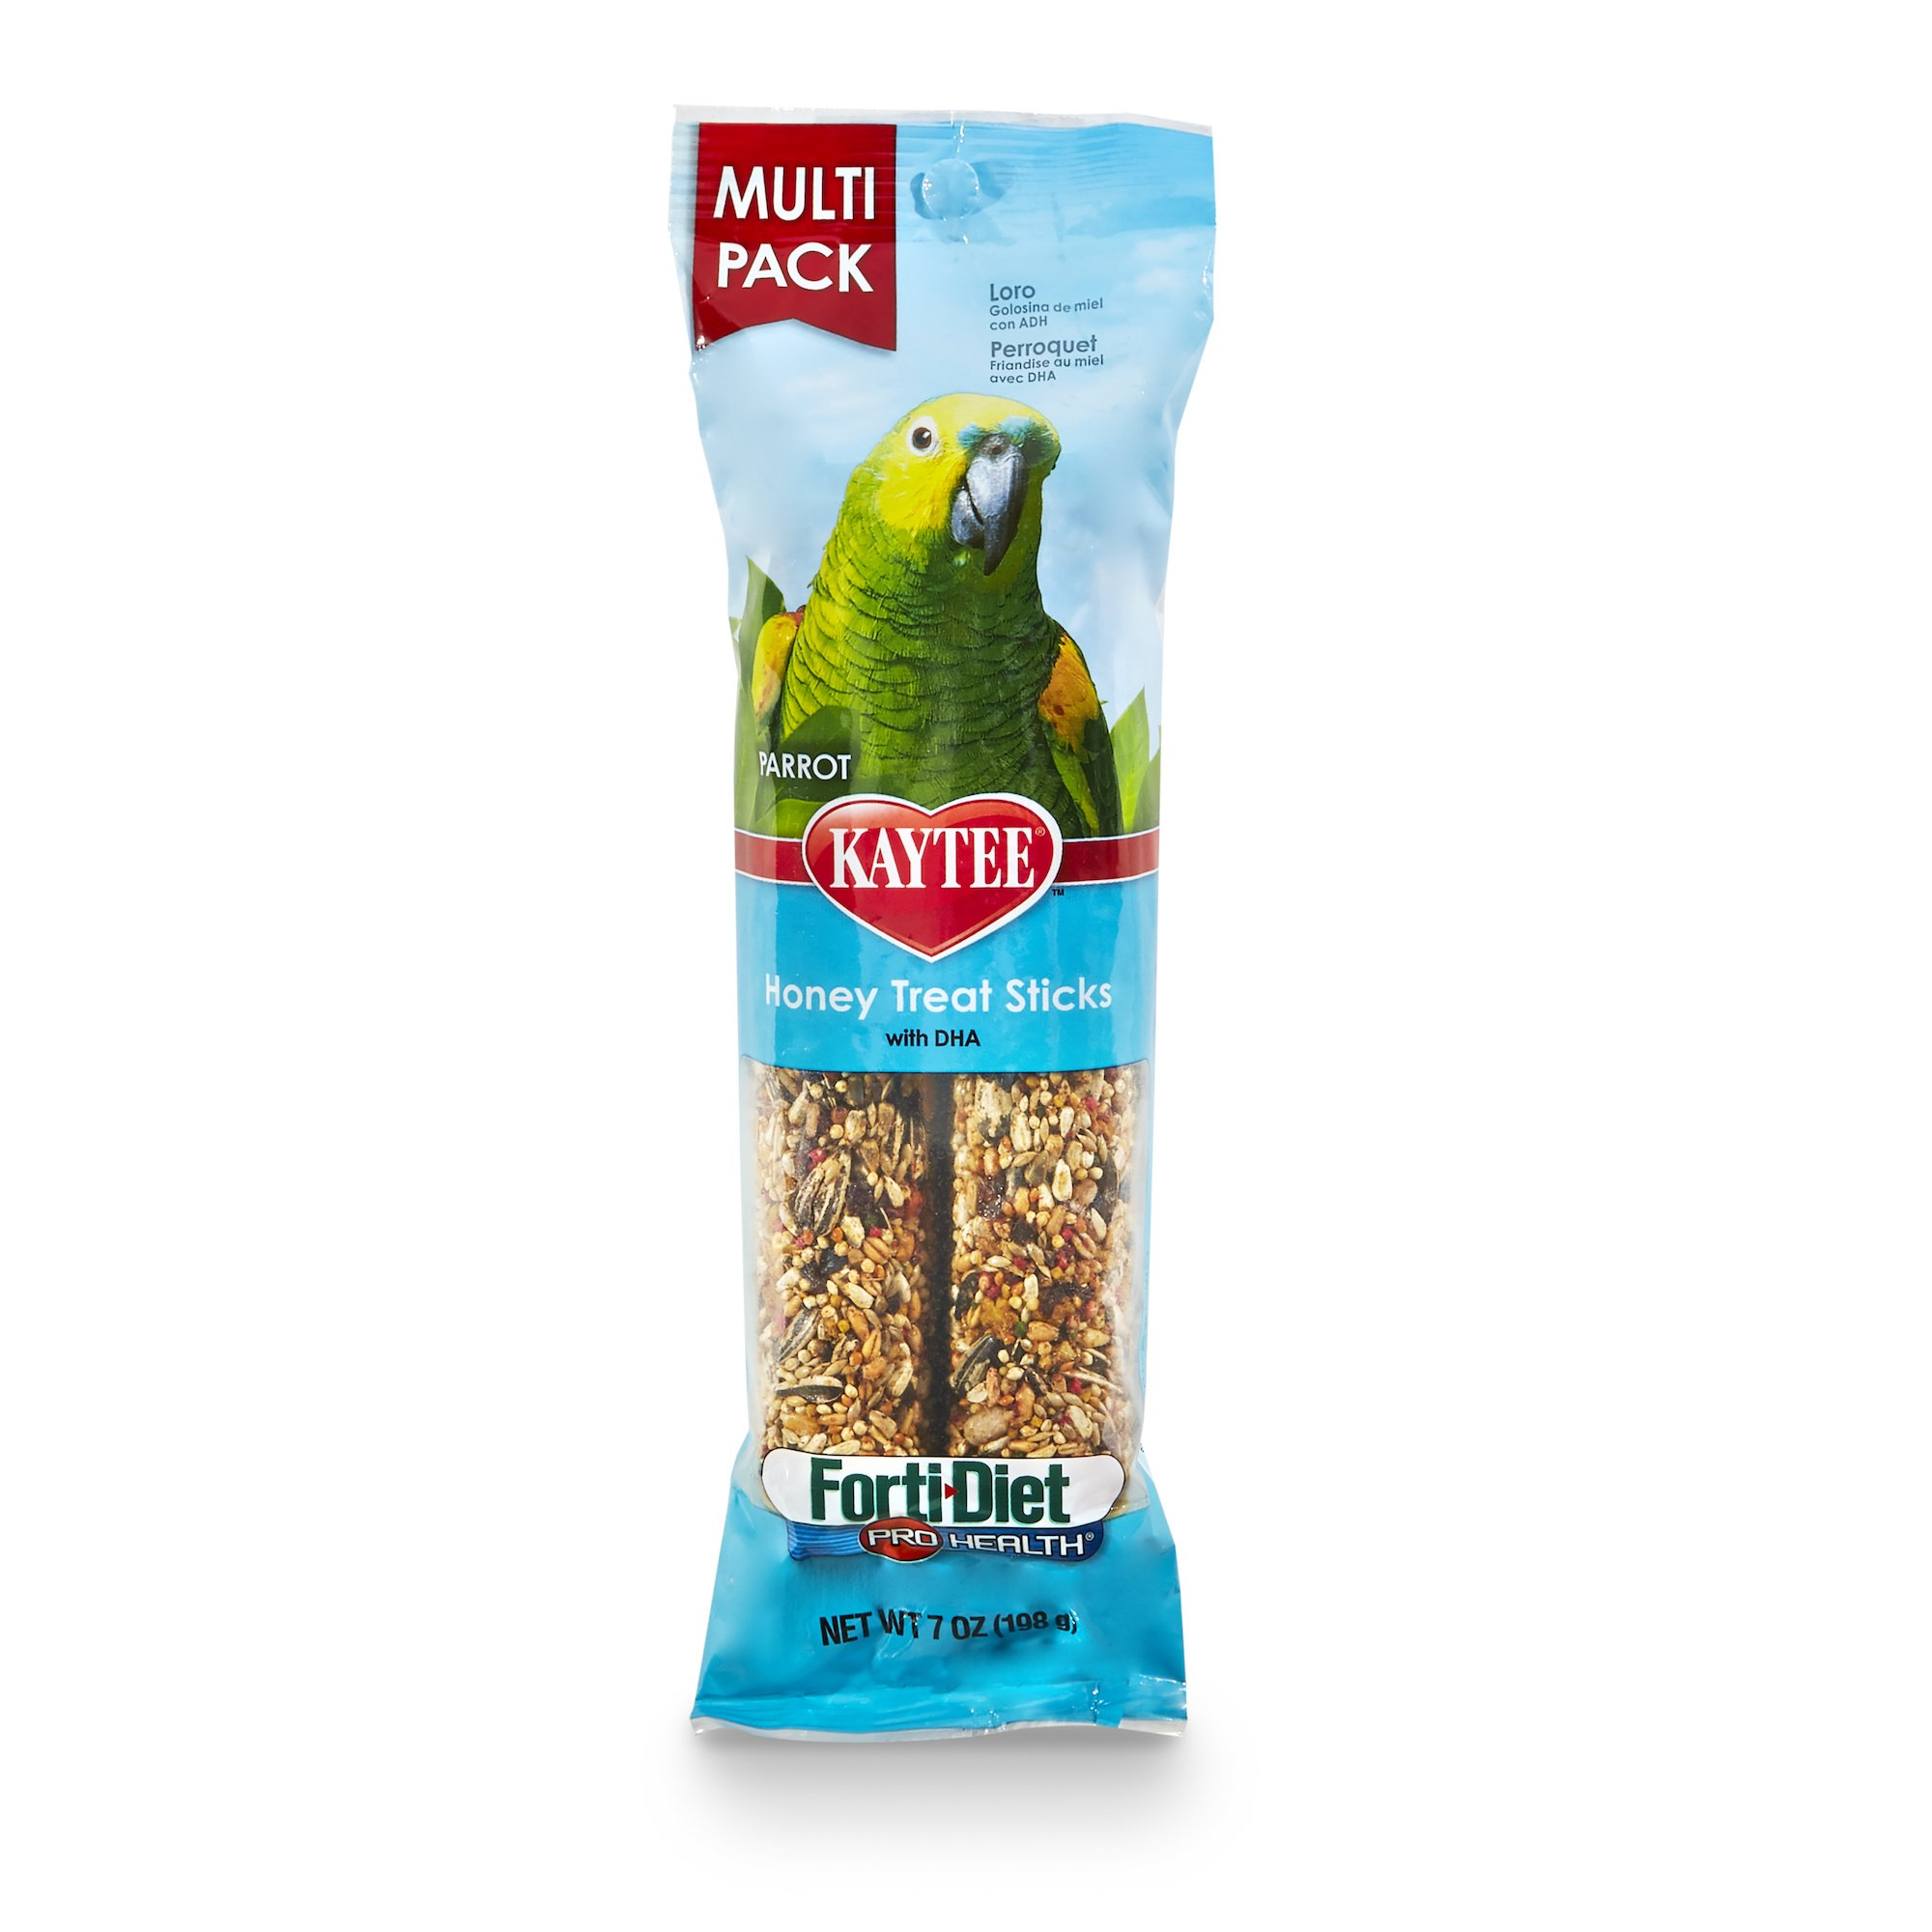 Kaytee Forti-Diet Pro Health Parrot Honey Treat Stick Value Pack, 7-Oz